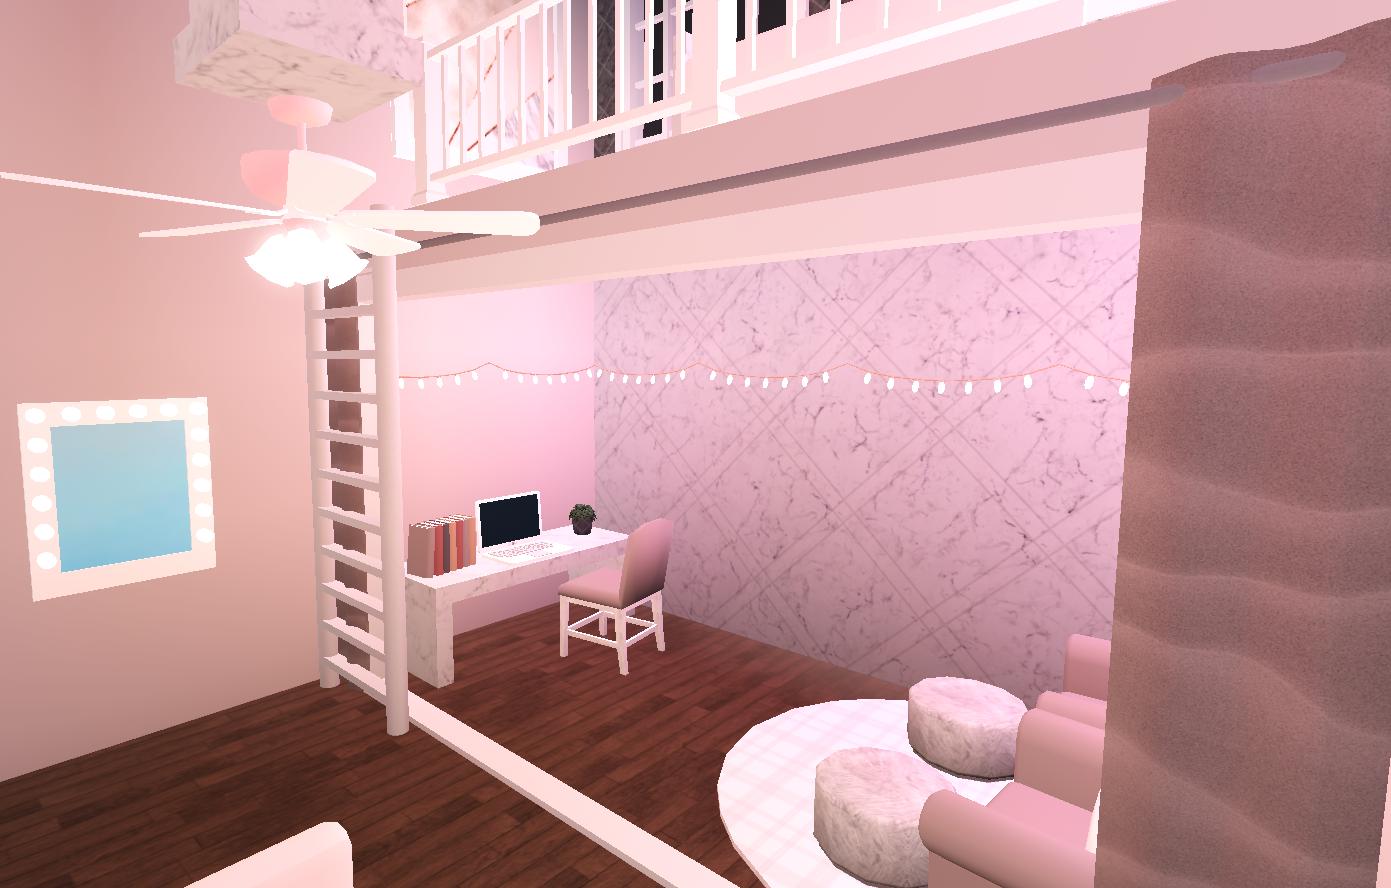 Pink Aesthetic Bloxburg Bedroom in 2020 Unique house